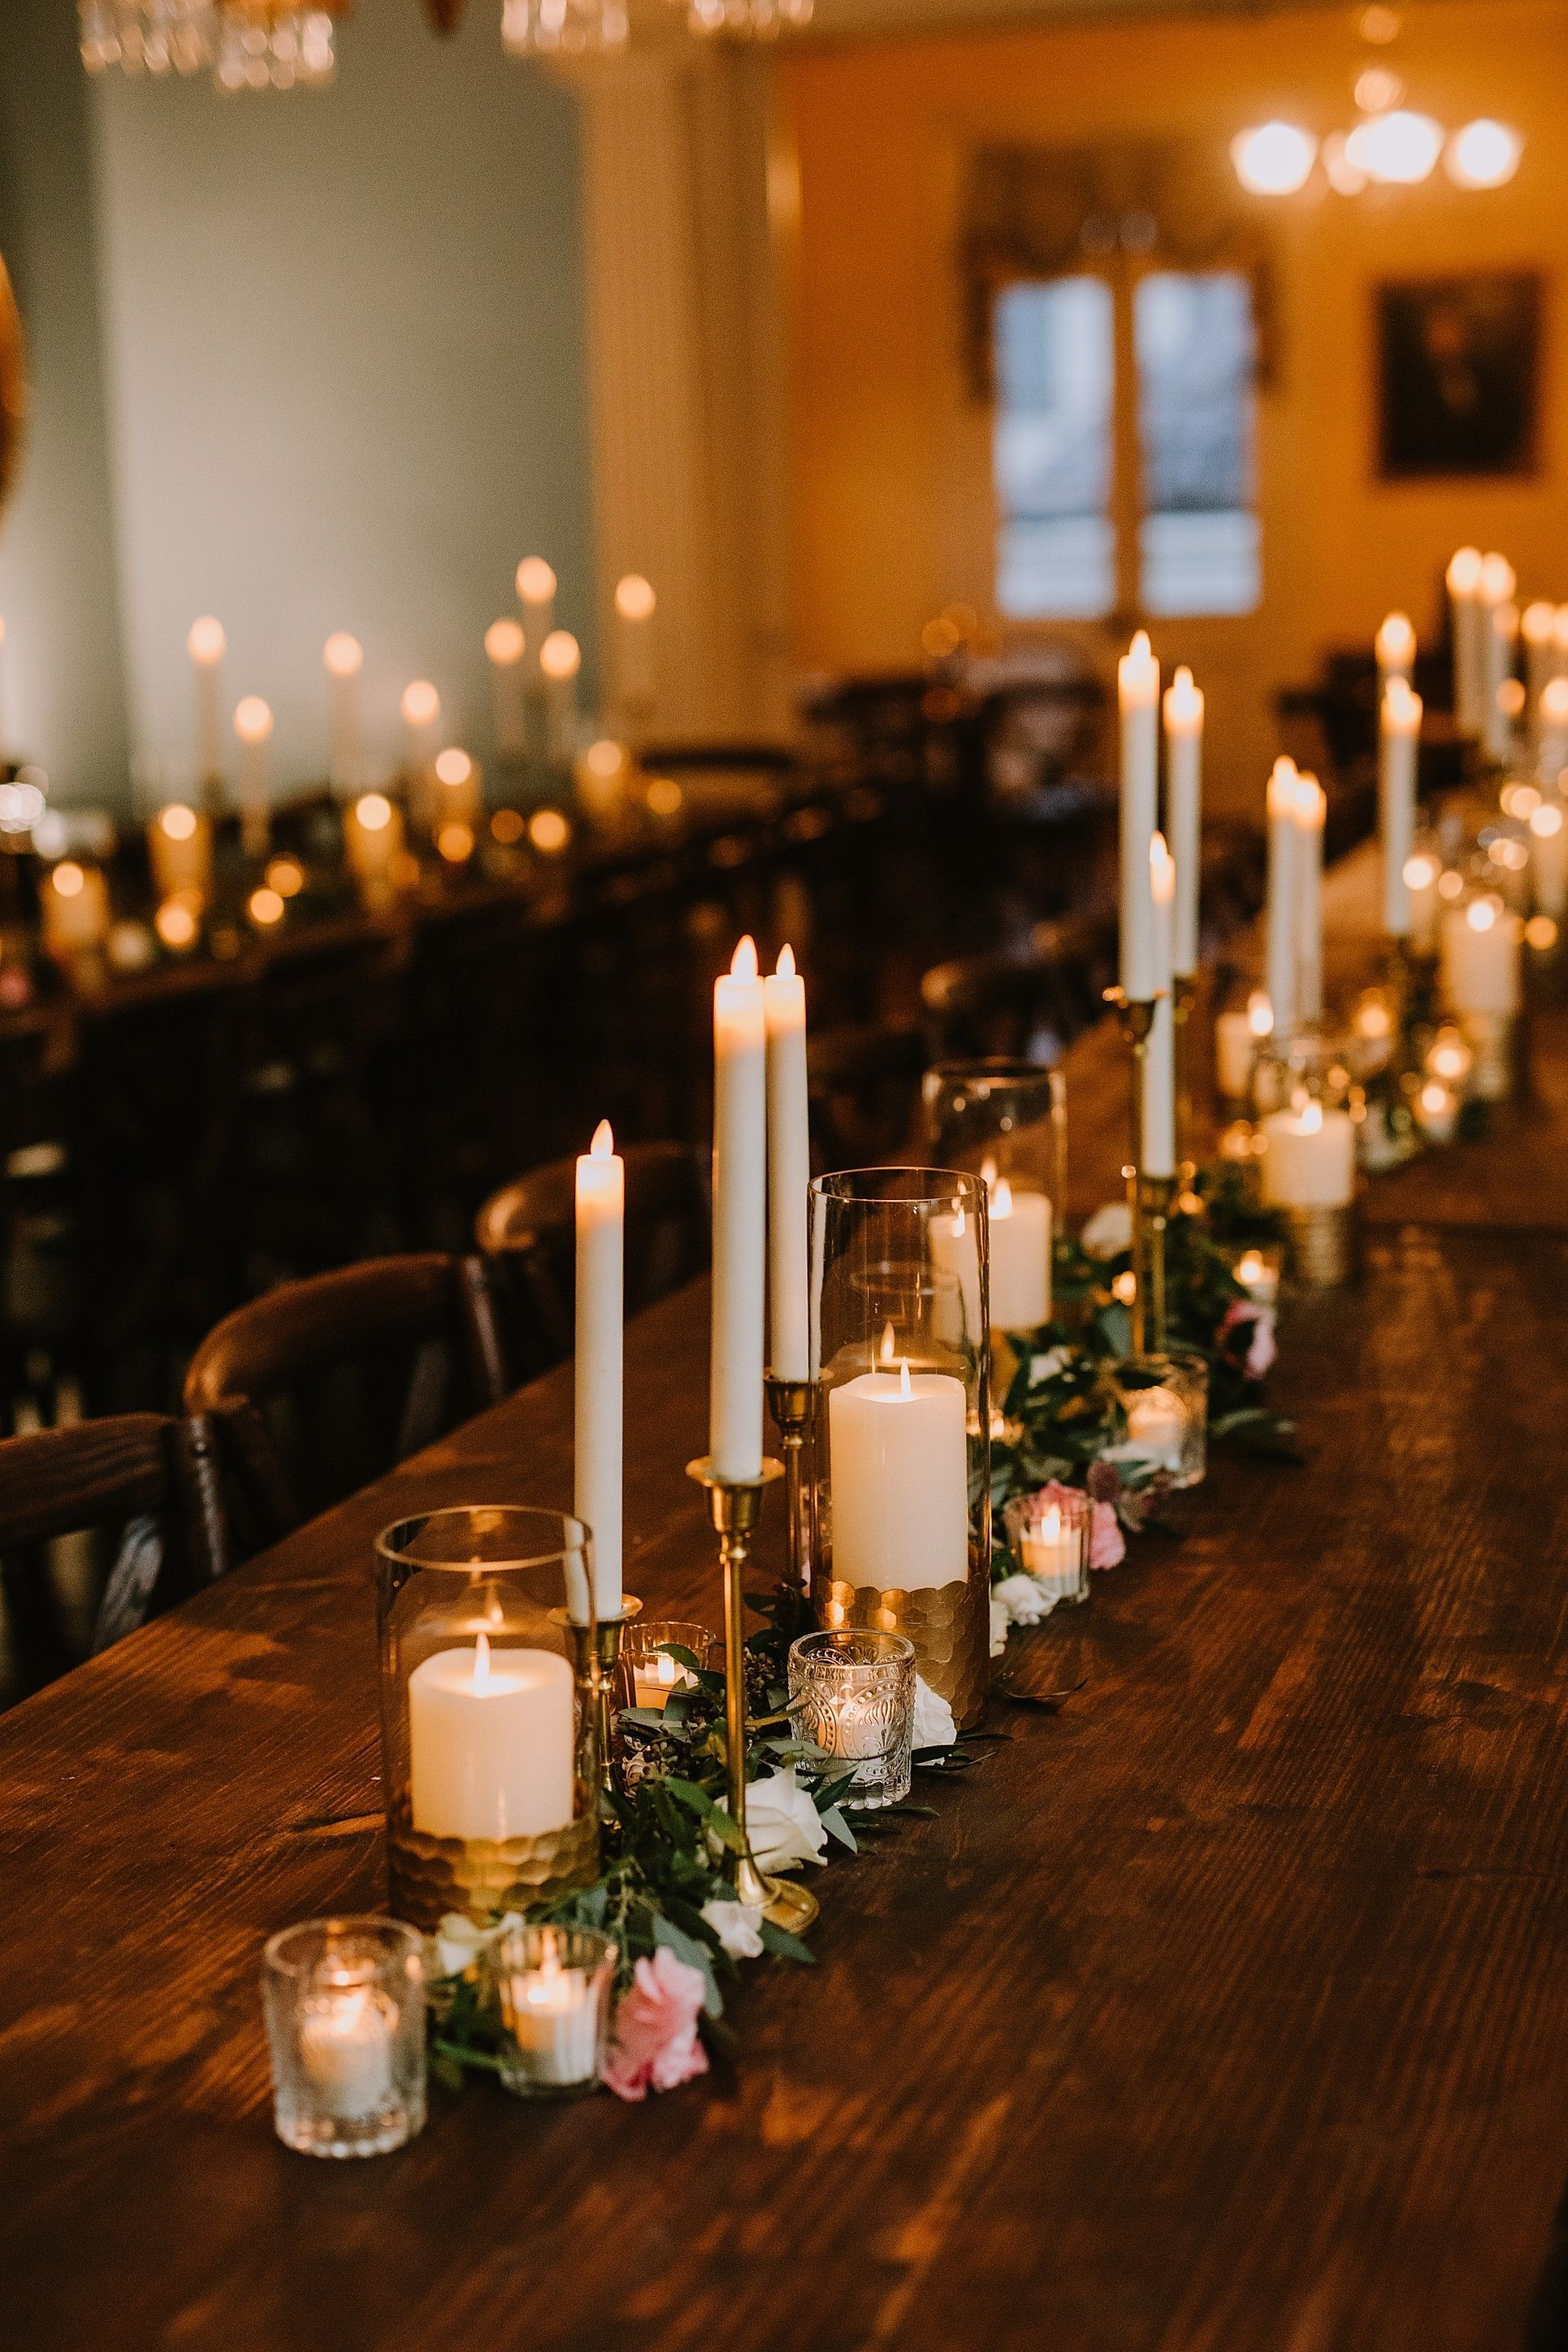 Paul Lisa Pharmacy Museum Beauregard Keyes House New Orleans Wedding Filled With Vintage Decor In 2020 Bistro Chairs Wedding New Orleans Wedding Candle Decor